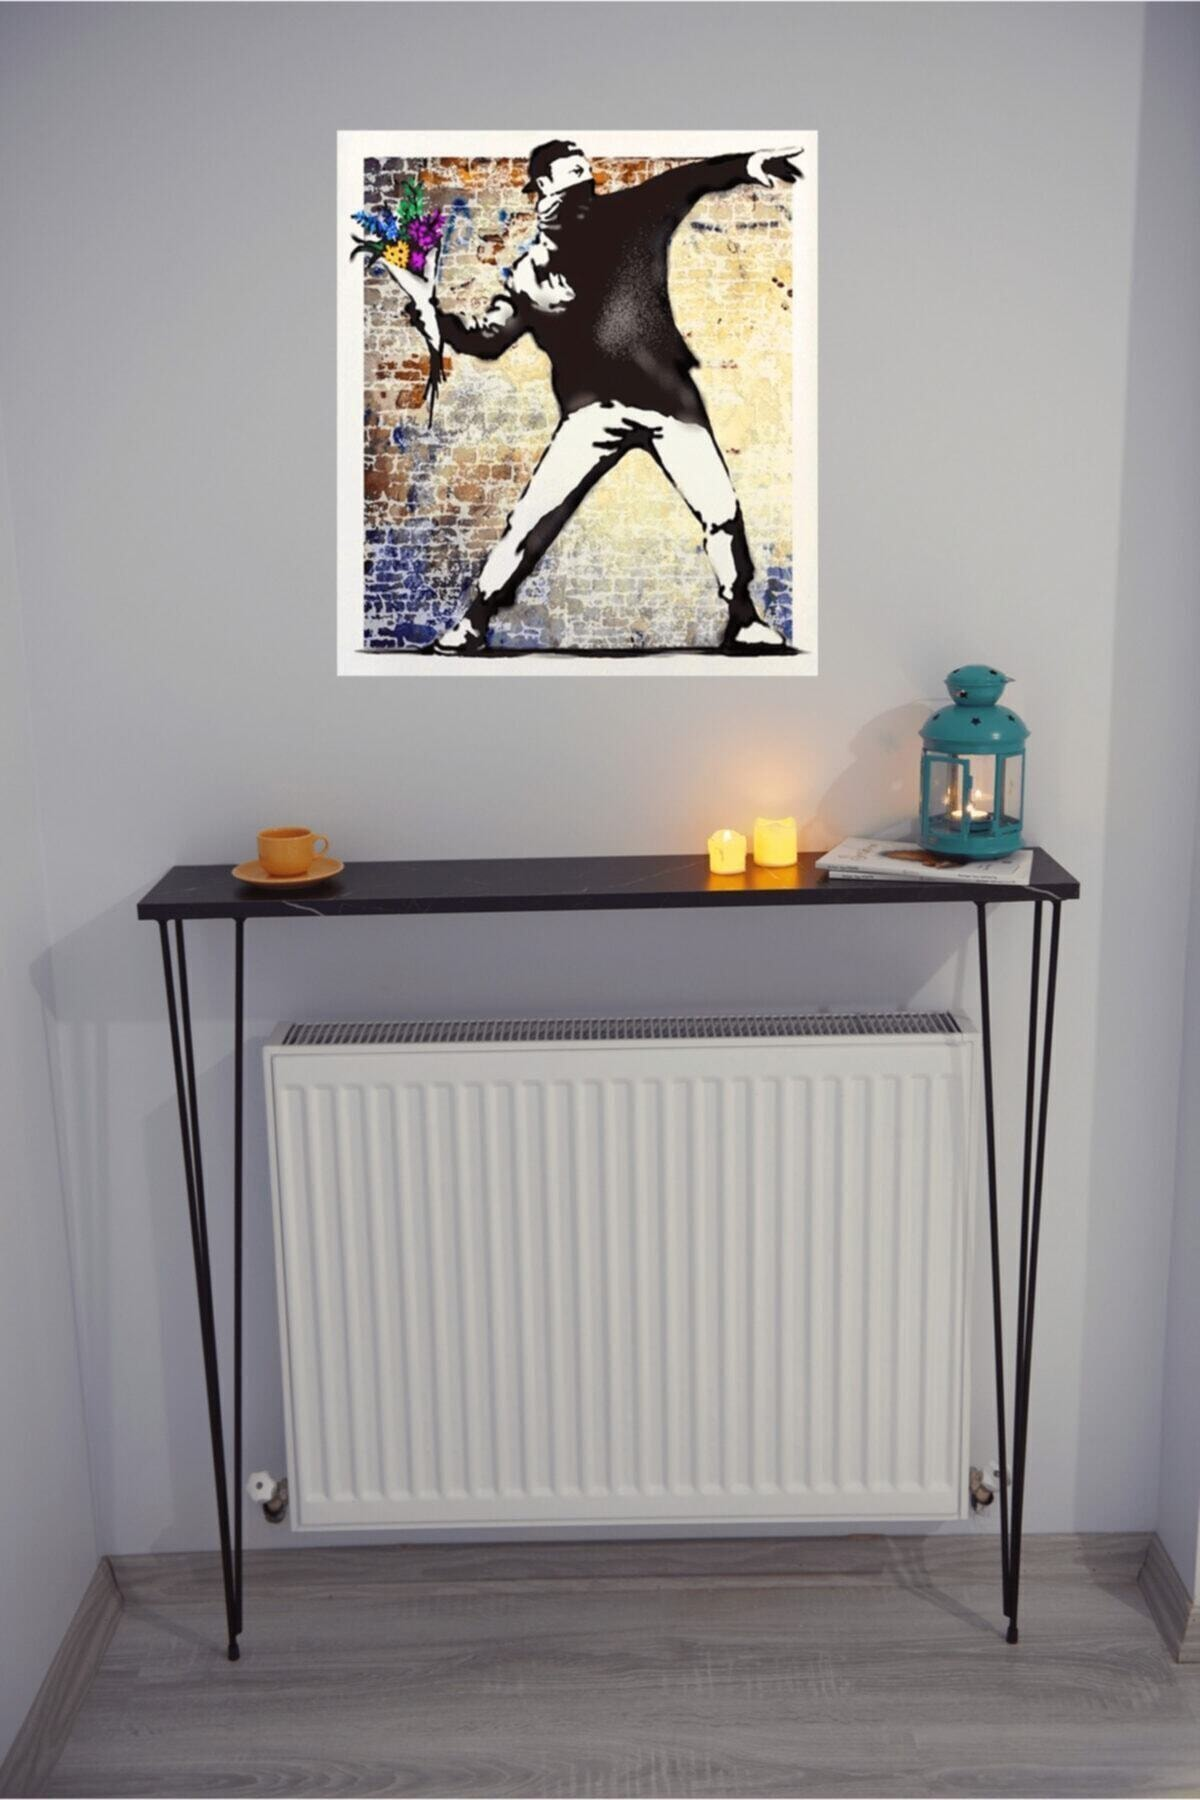 Petek Üstü Ayaklı Raf Dresuar Mermer Desen/mat Siyah 100x90x18 Cm